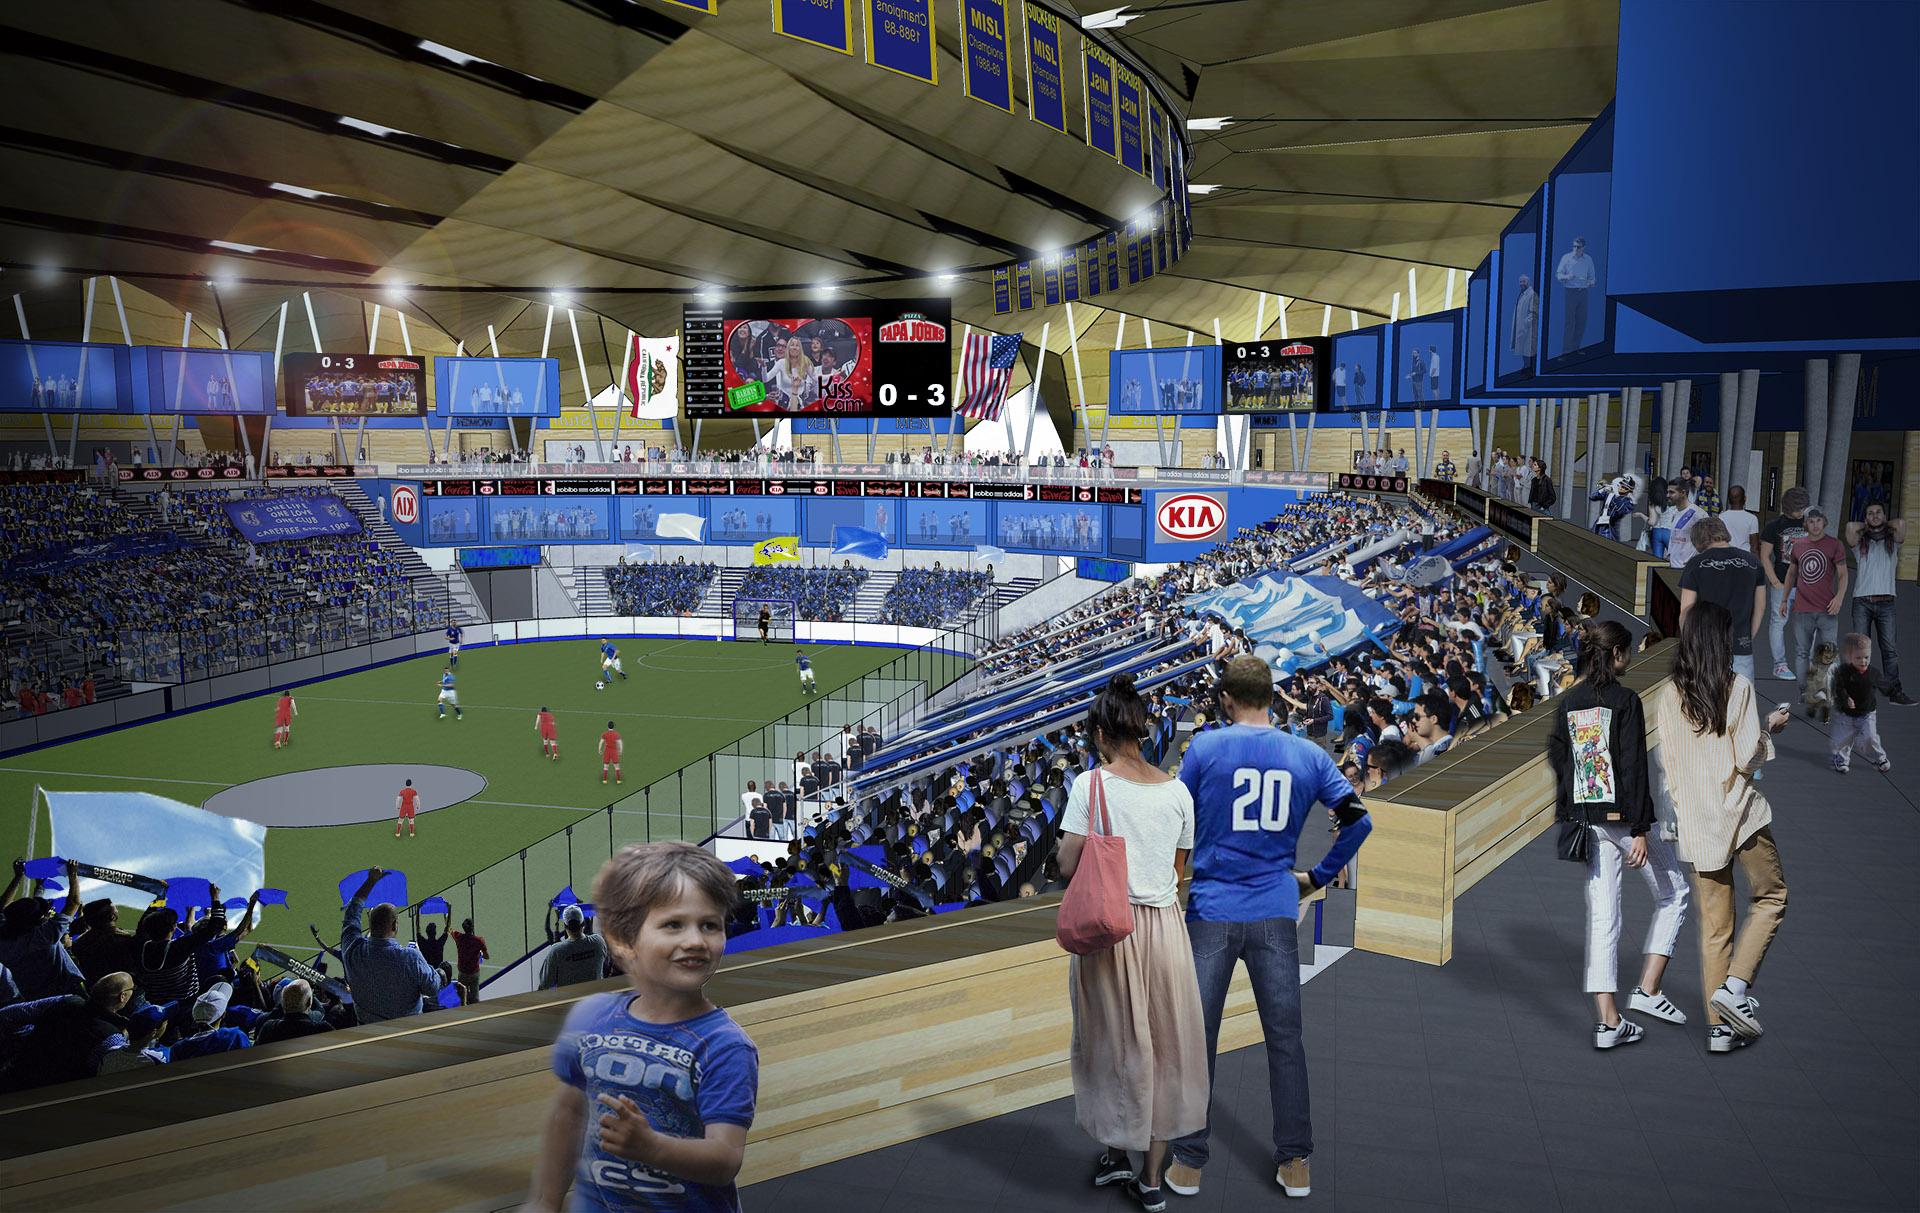 San Diego Arena - Architects Mosher Drew02.jpg